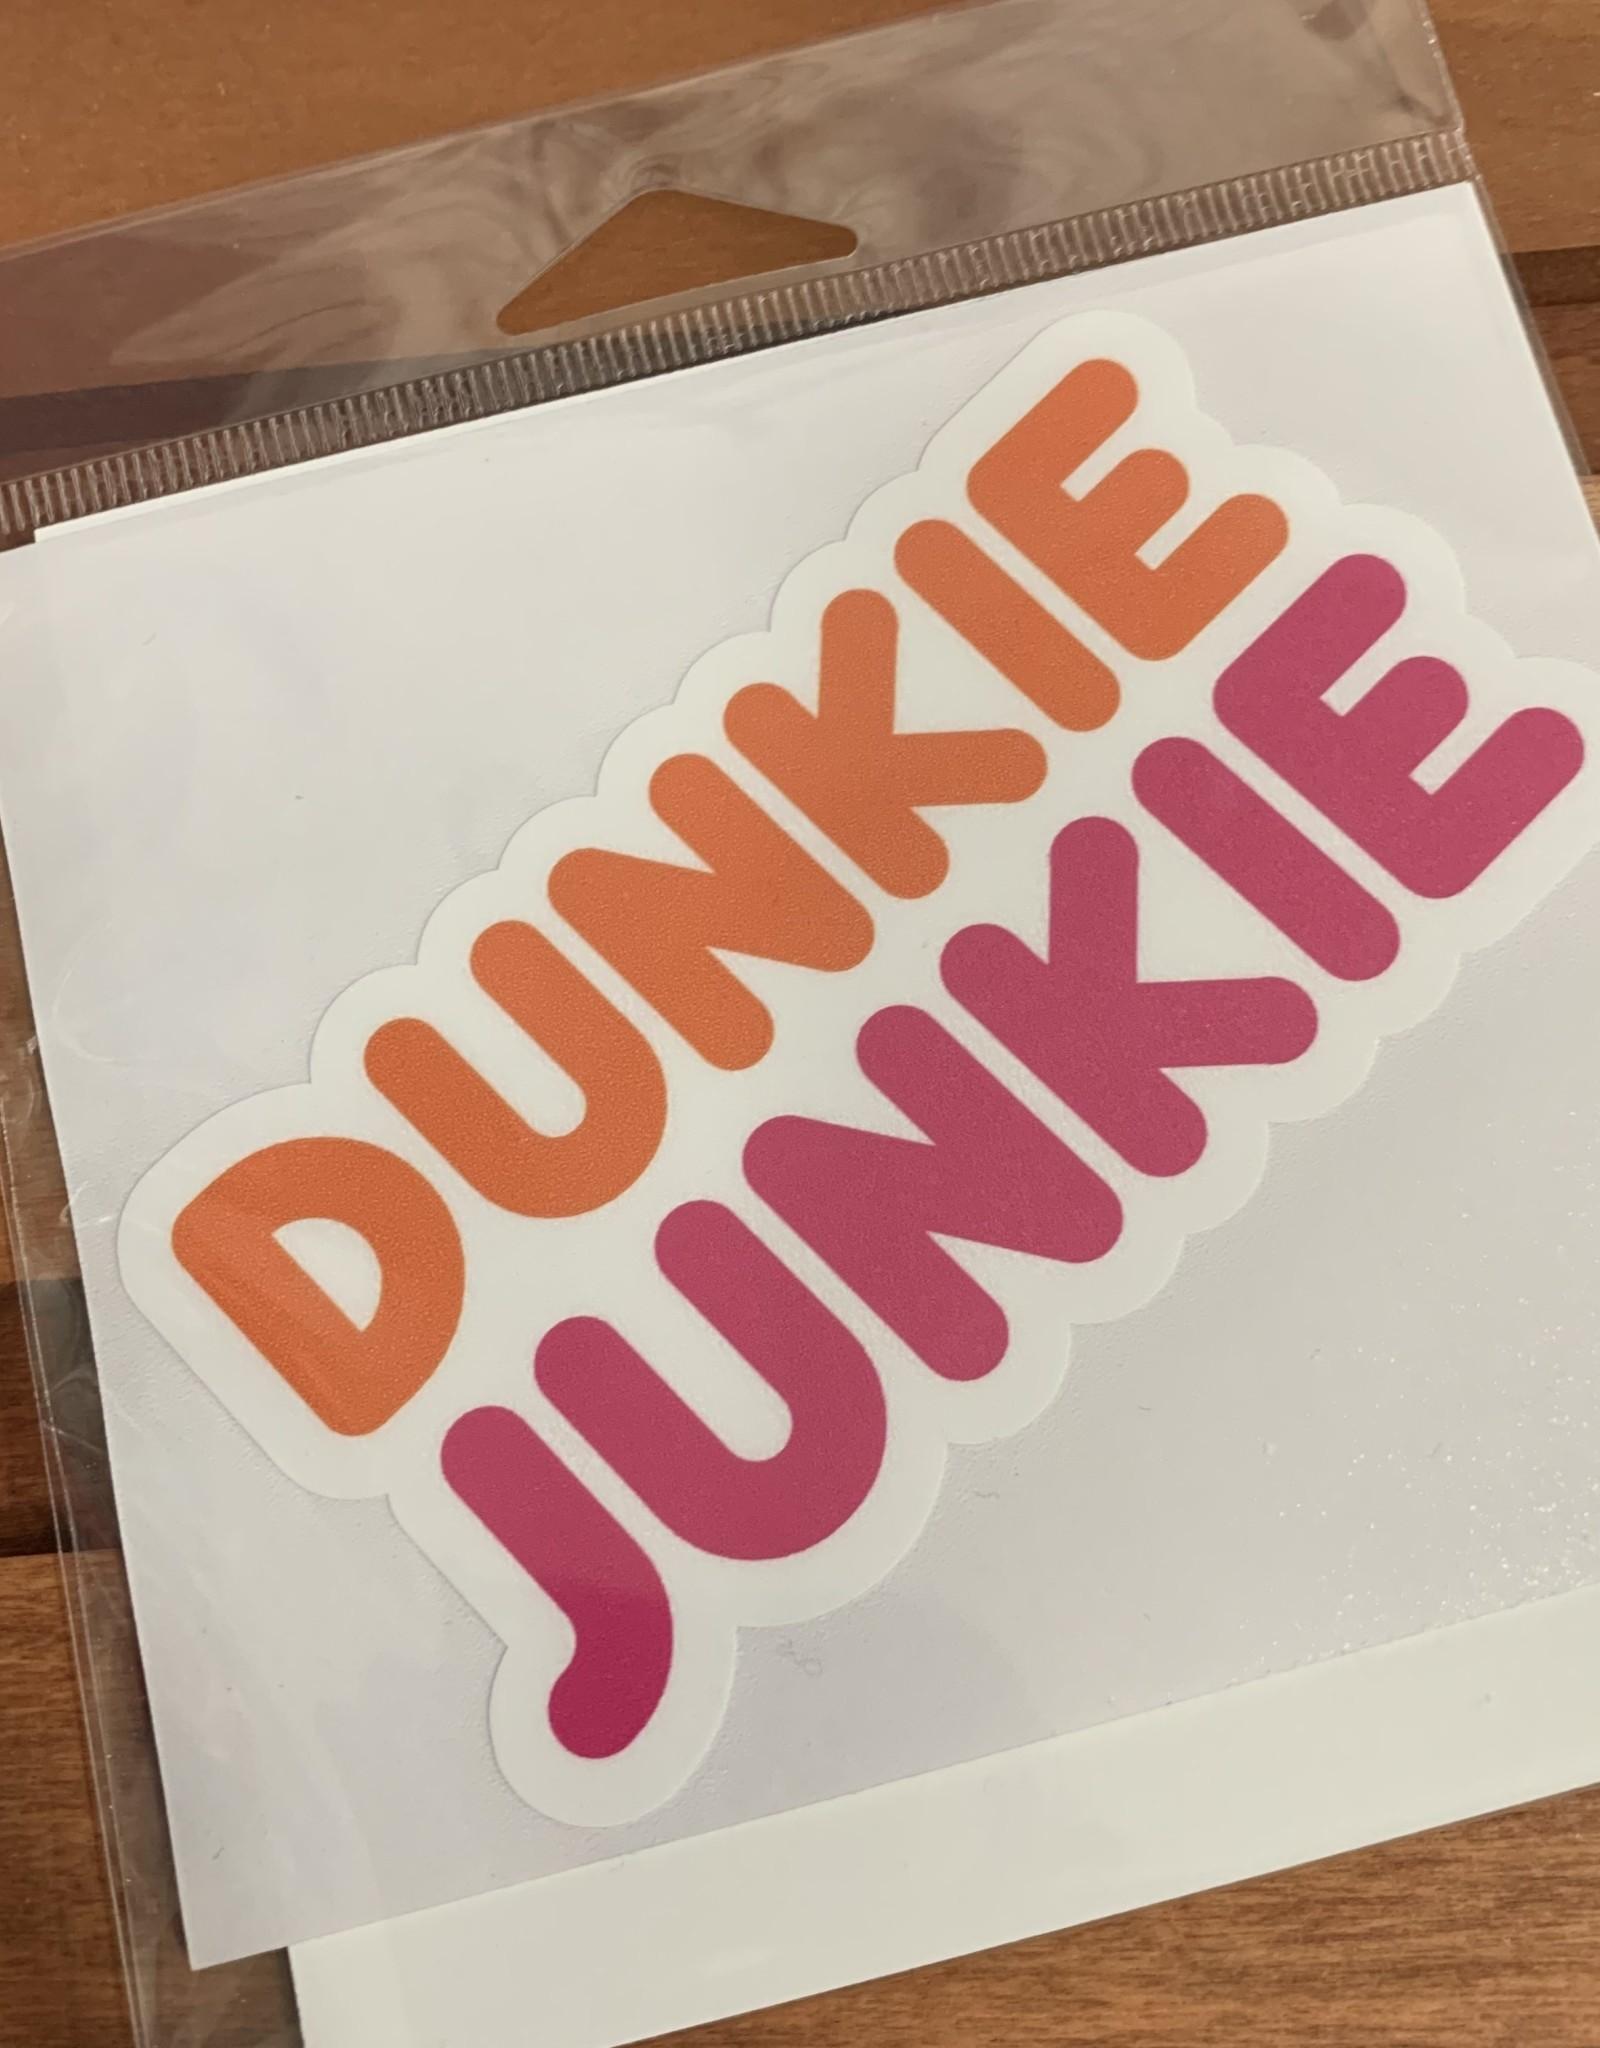 DUNKIE JUNKIE STICKER (LARGE)